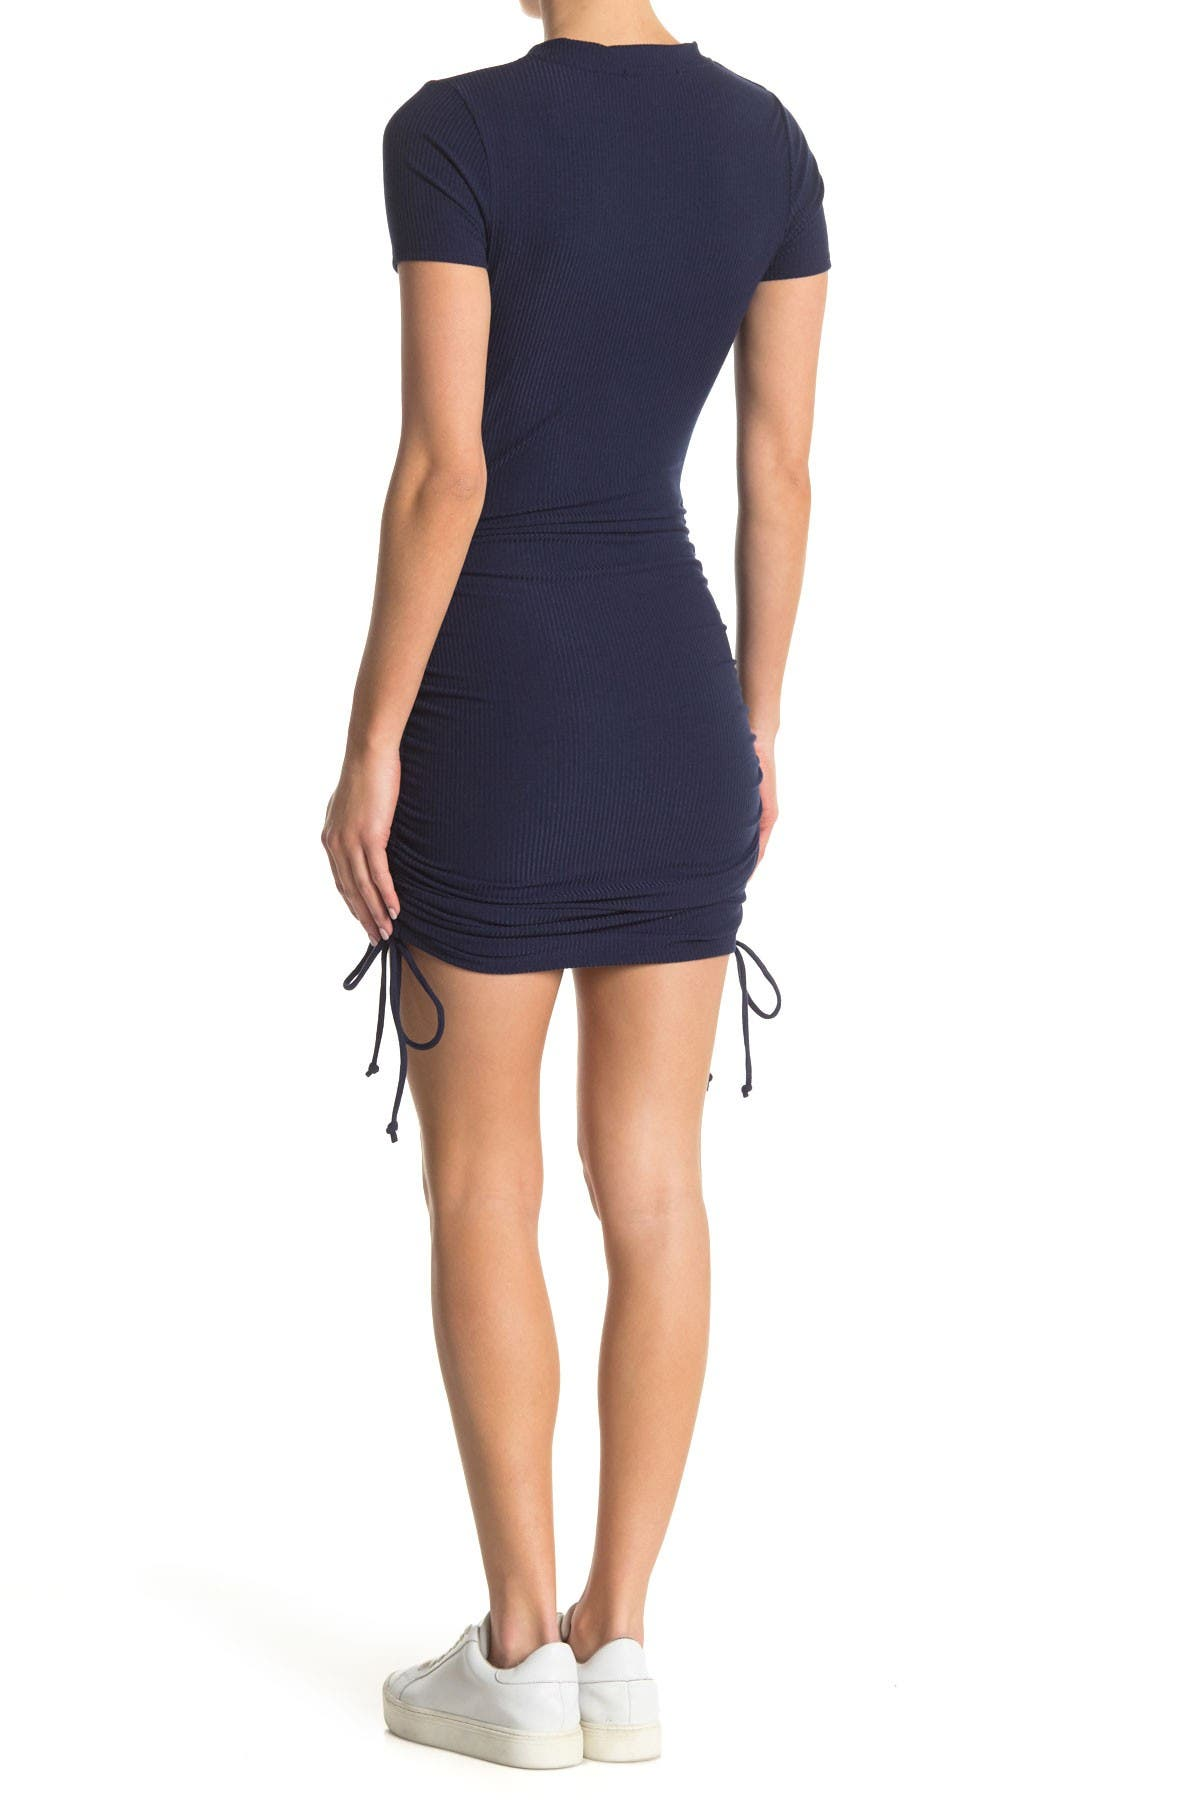 Image of KENEDIK Ruched Side Tie Short Sleeve Mini Dress